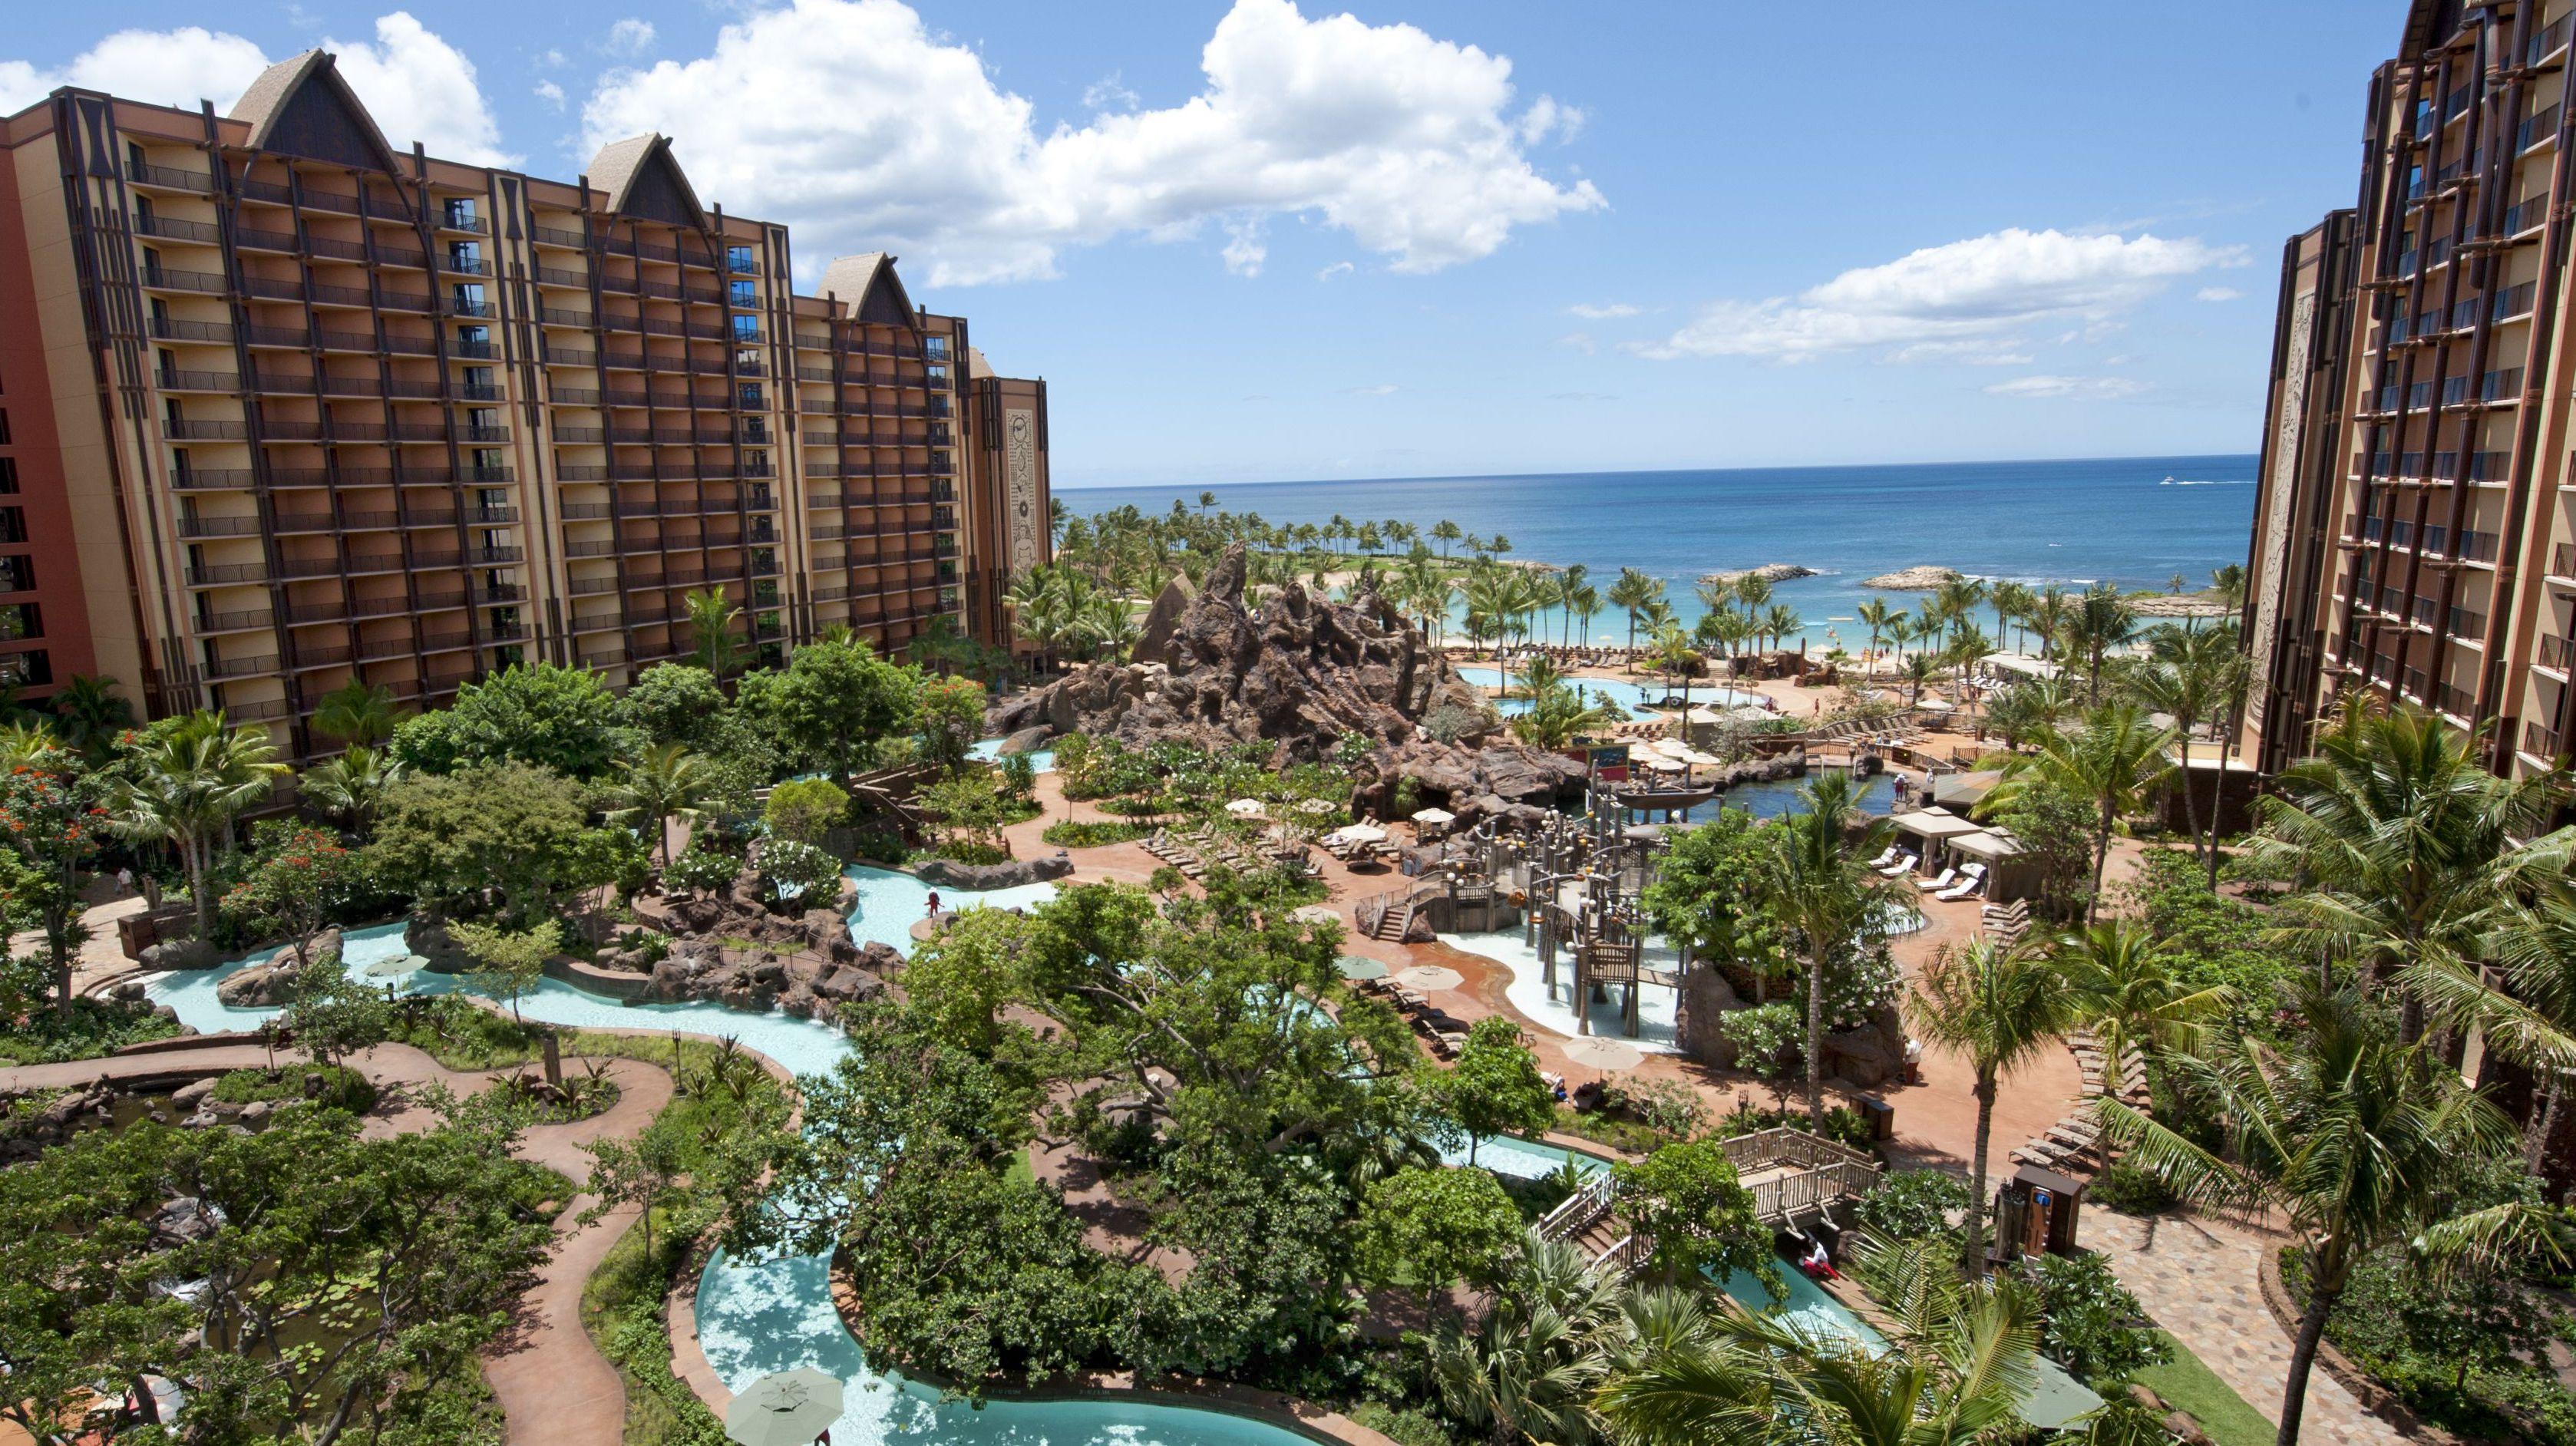 14 Top Reasons to Visit Disneys Aulani in Hawaii